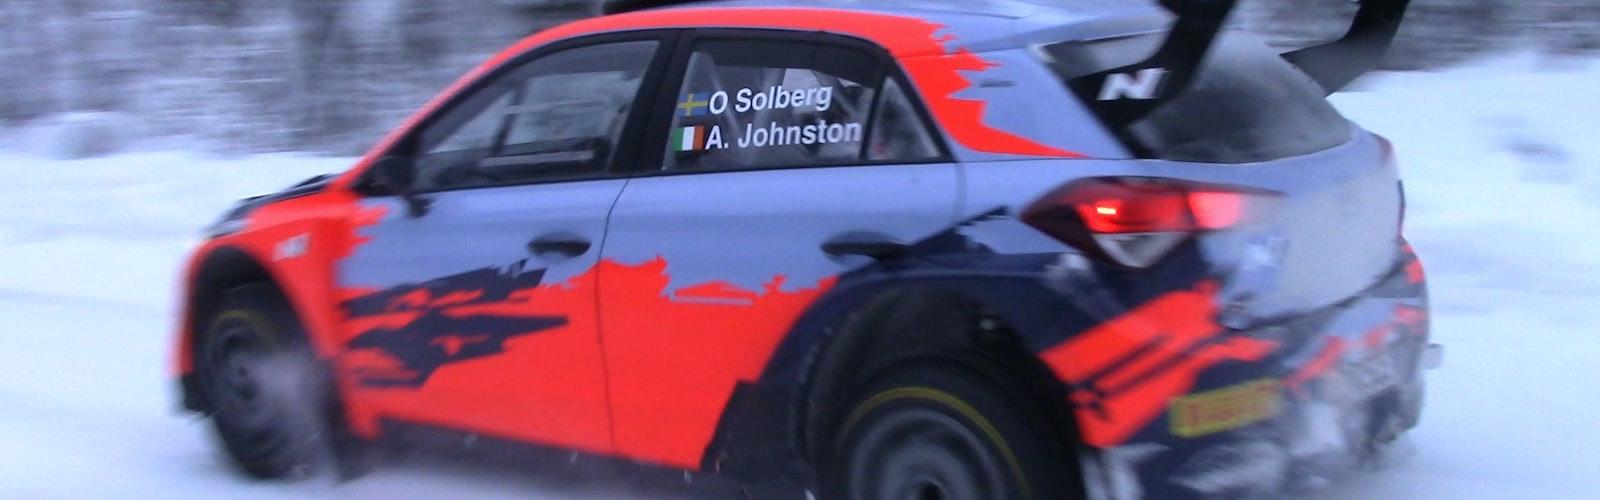 Oliver Solberg 1